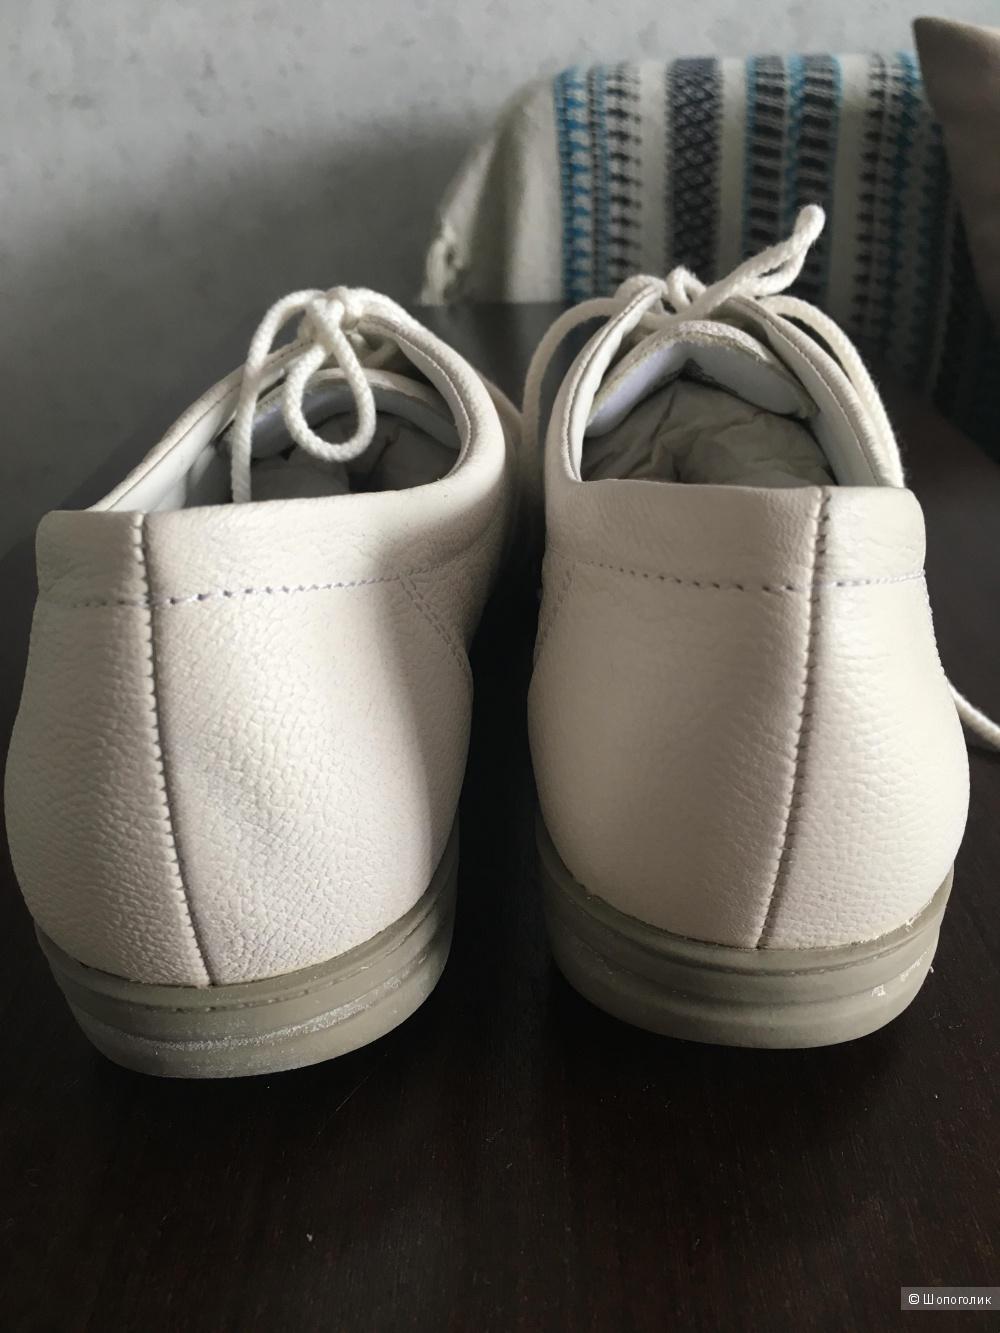 Ботинки Easy Spirit, 8 US (37-38 размер)